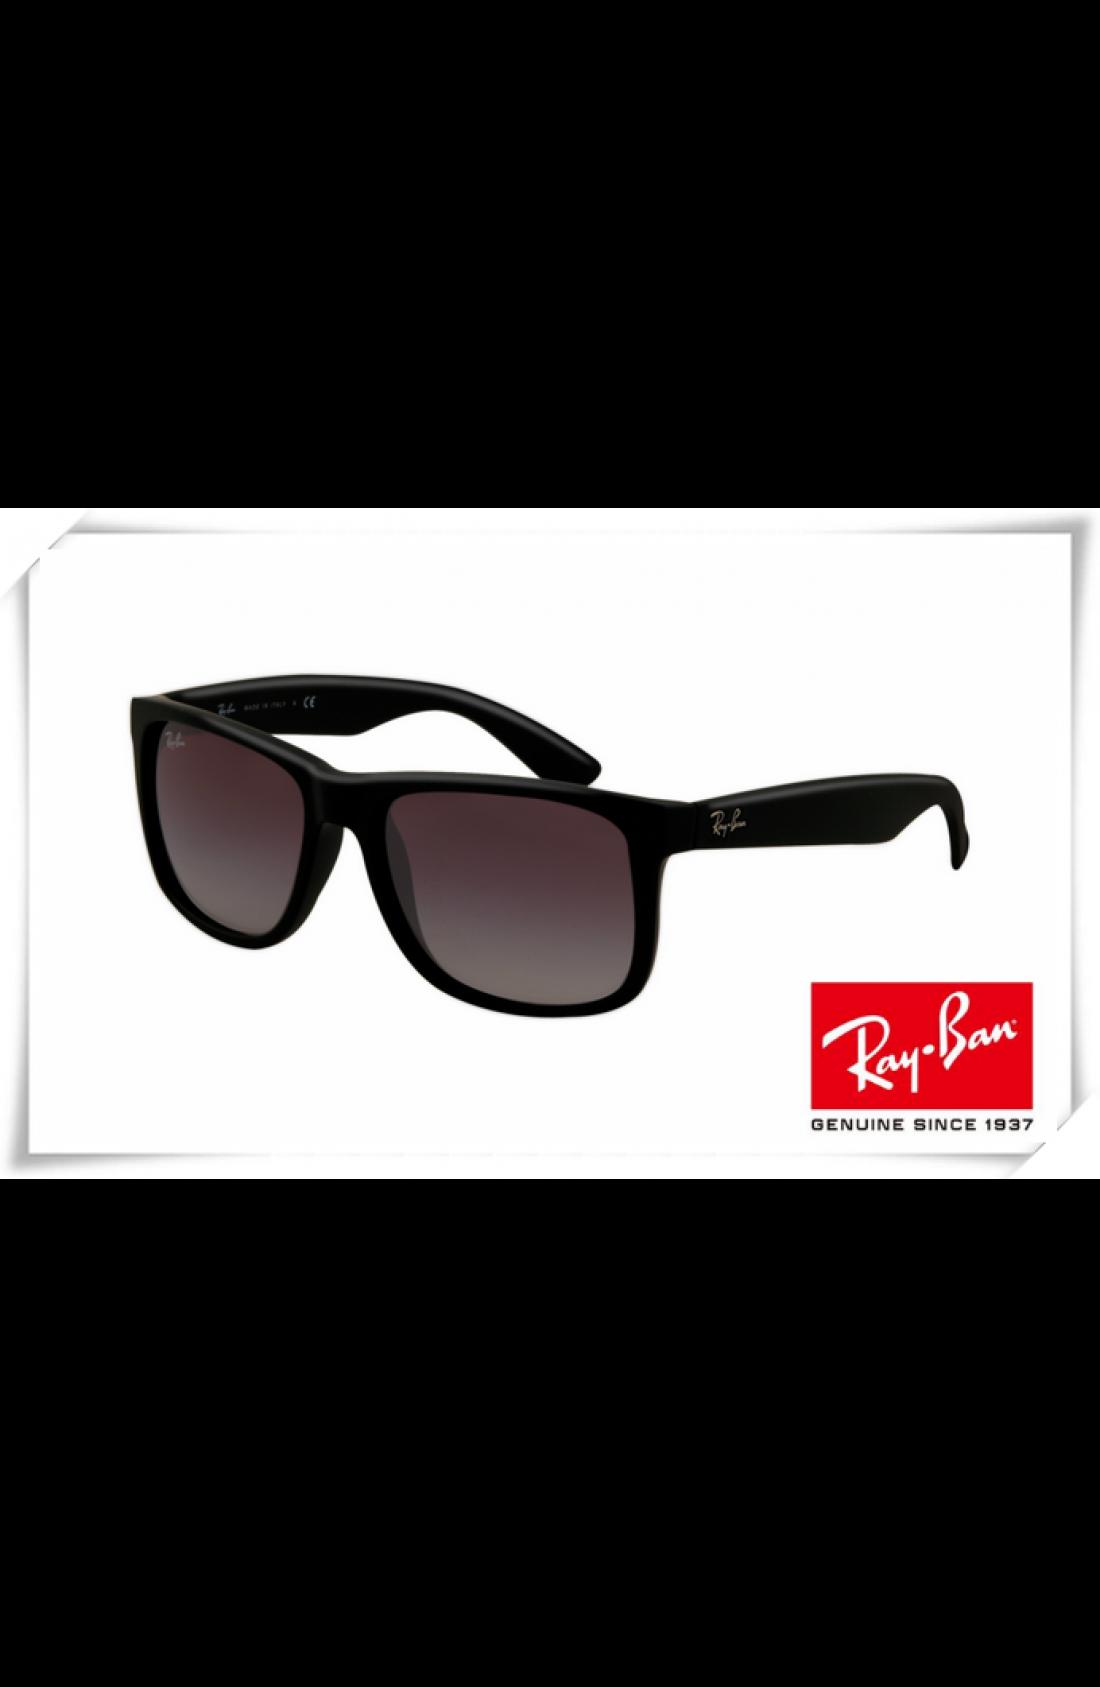 bc22cf08c3 Fake Ray Ban RB4165 Justin Sunglasses Shiny Black Frame Purple ...